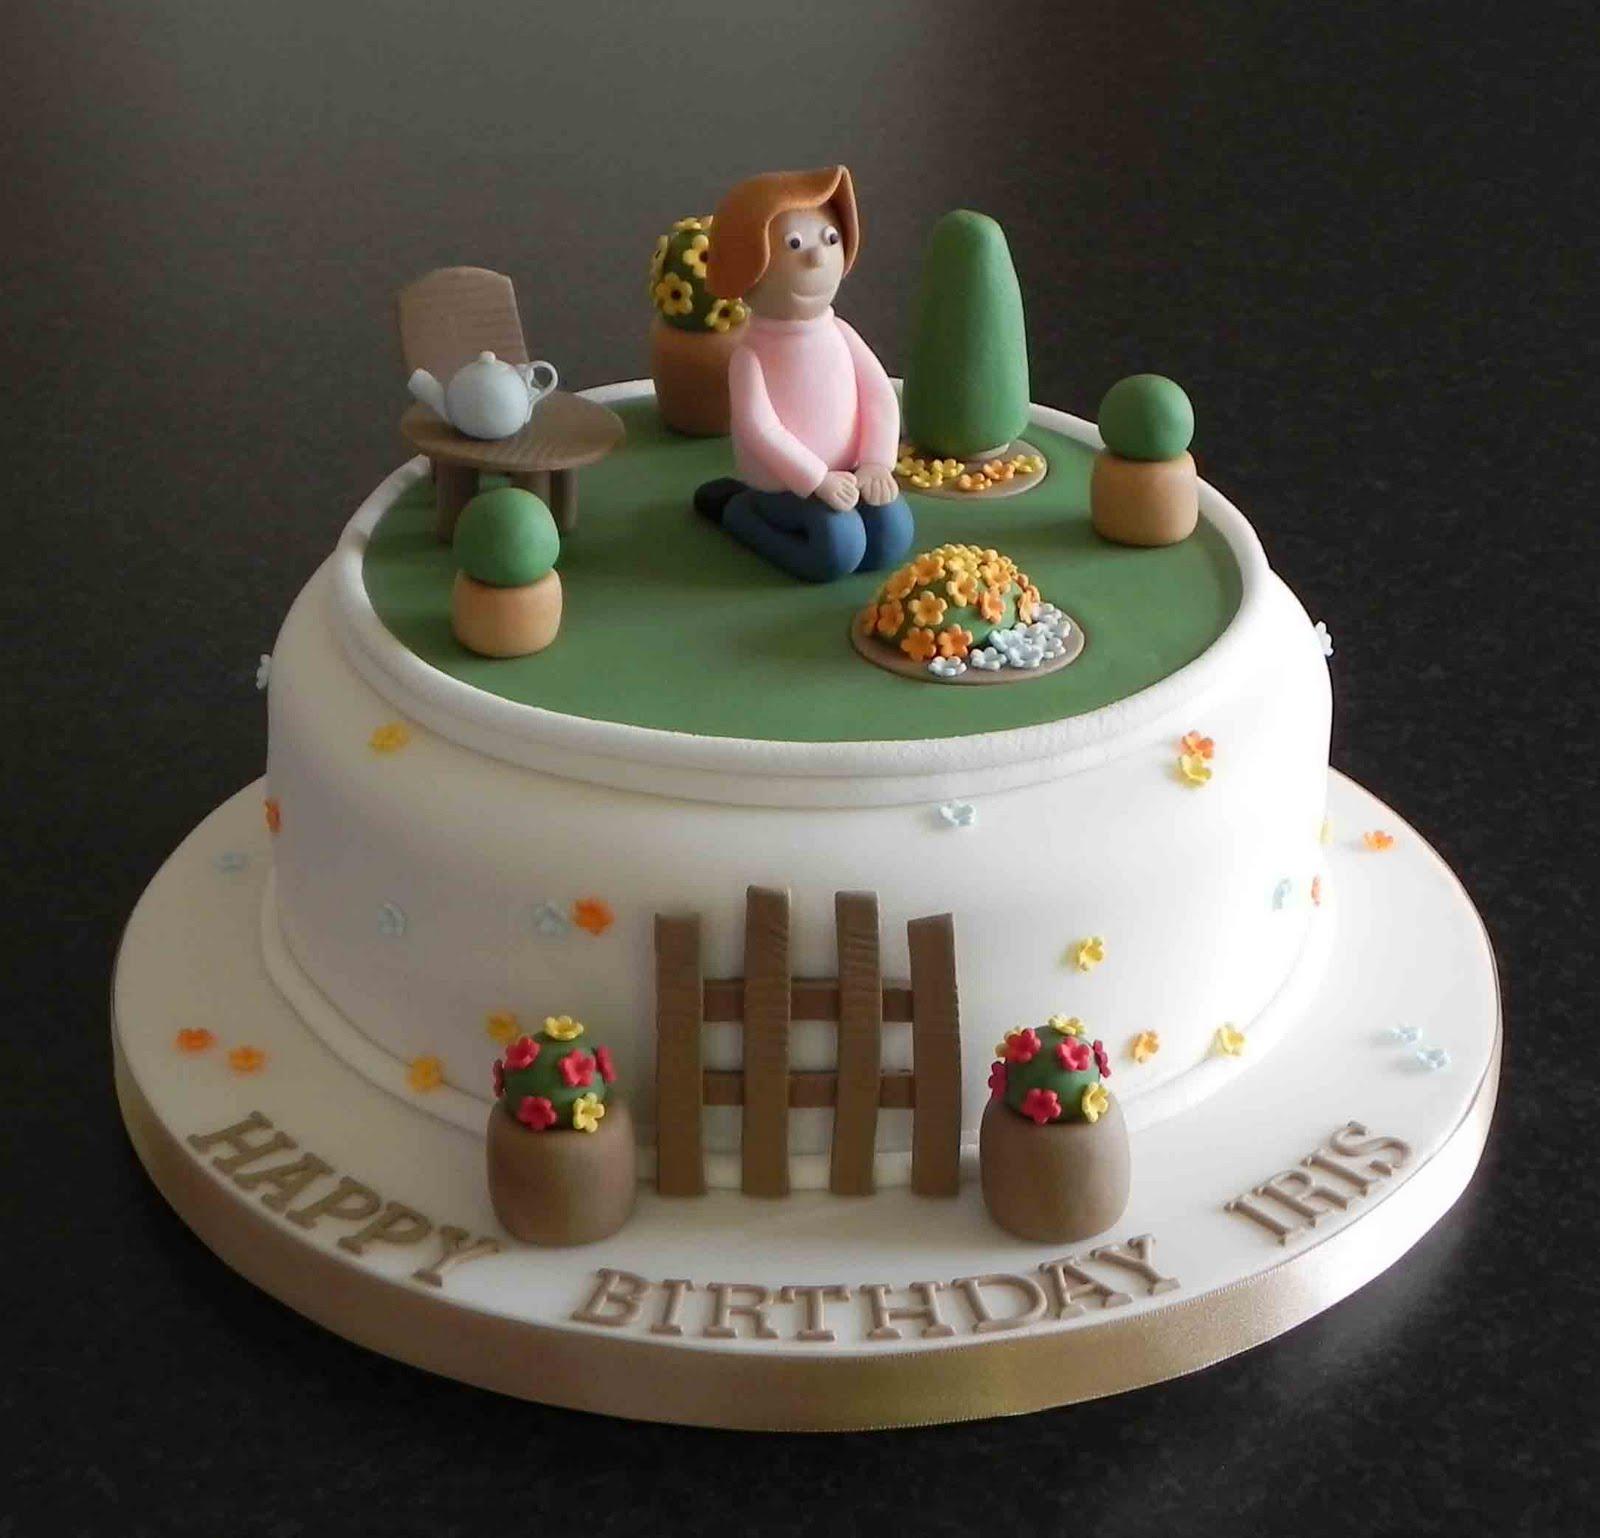 Free Cake Info: Gardening cakes